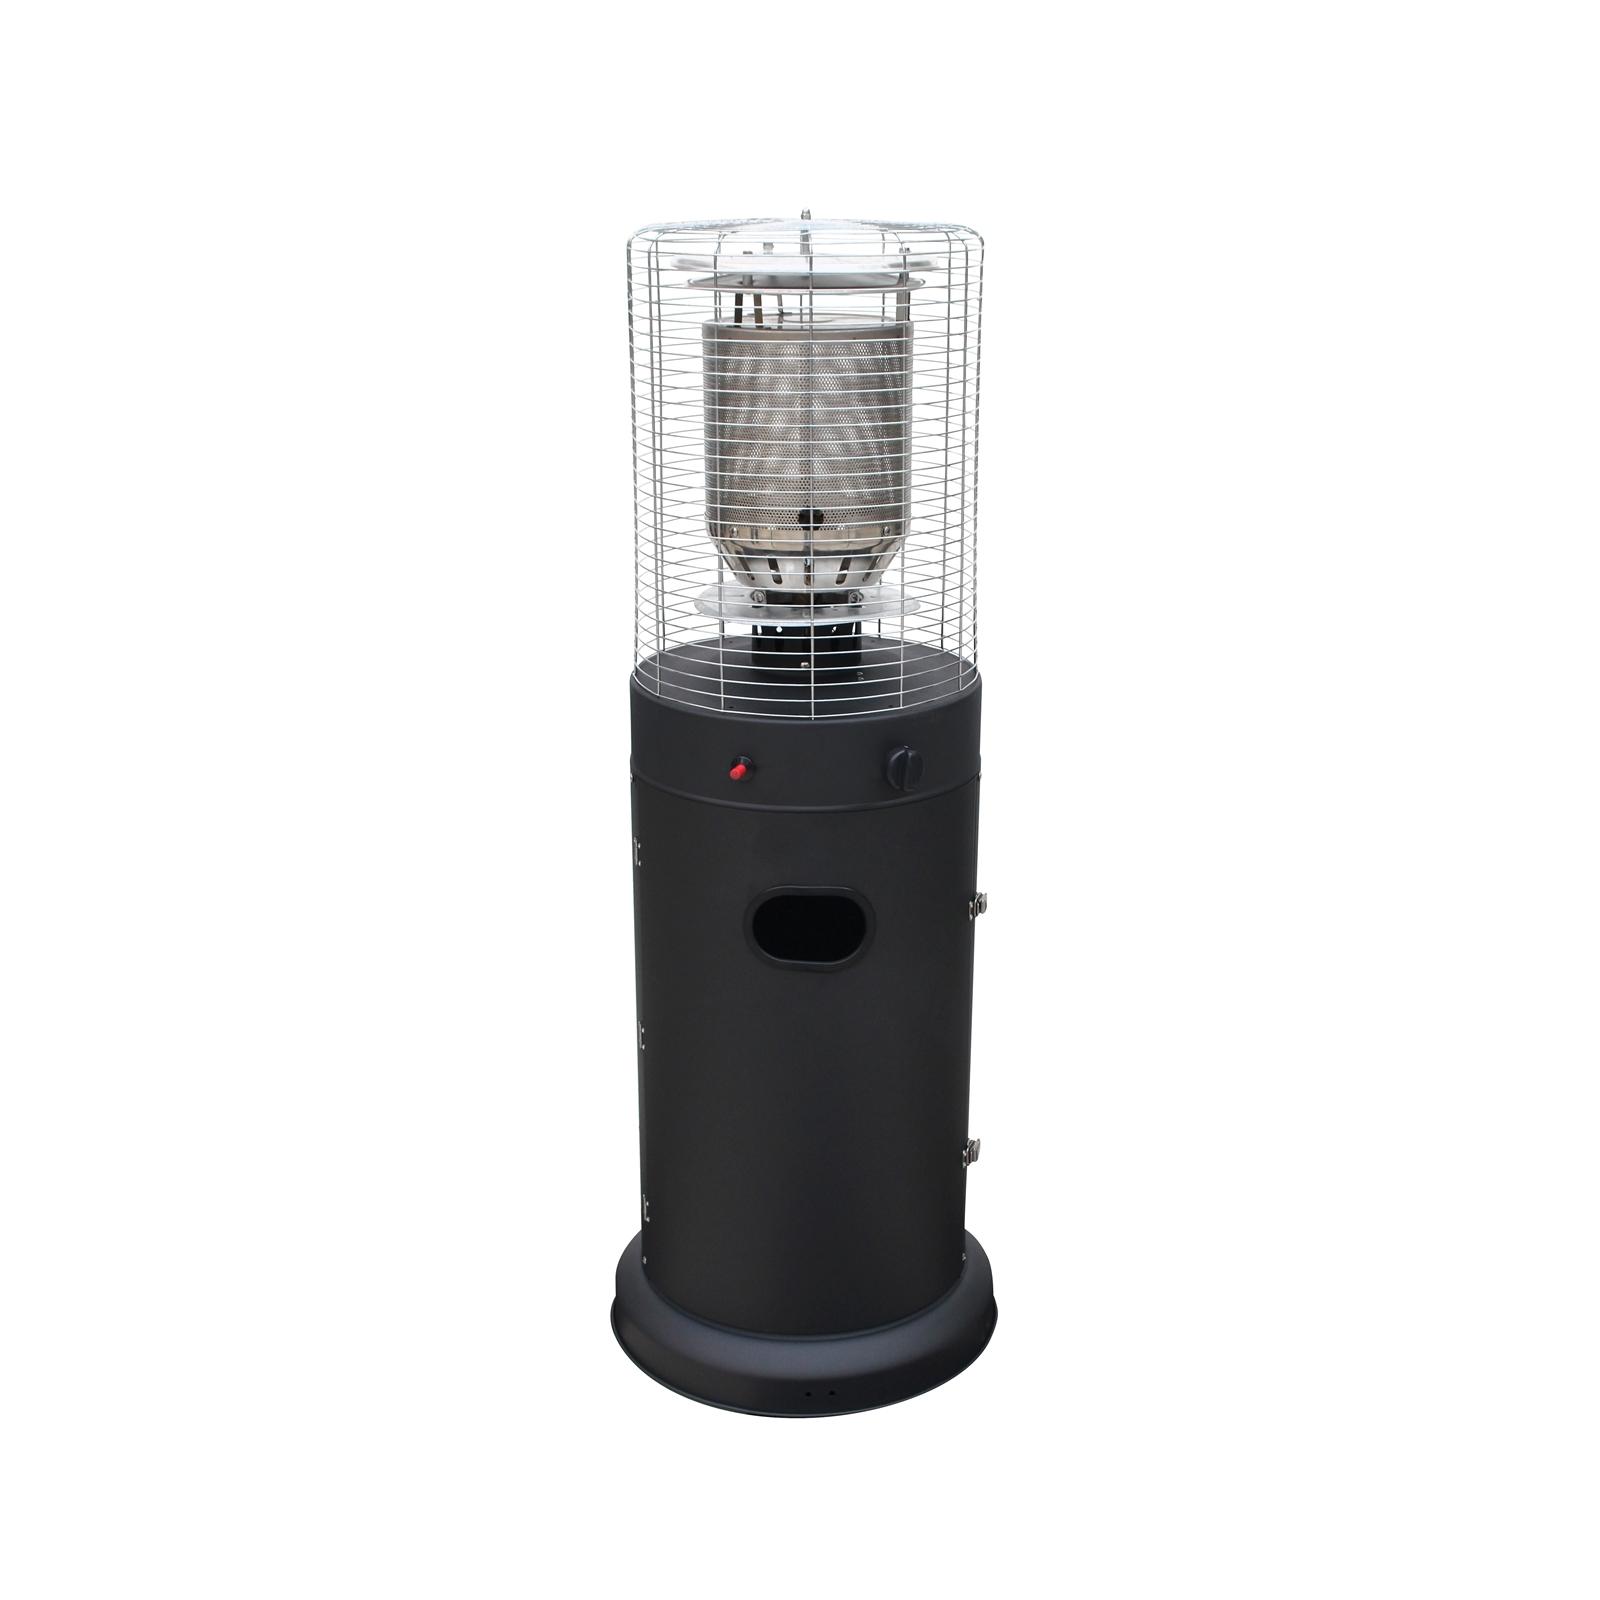 Fiammetta Outdoor Area Gas Heater - Matte Black